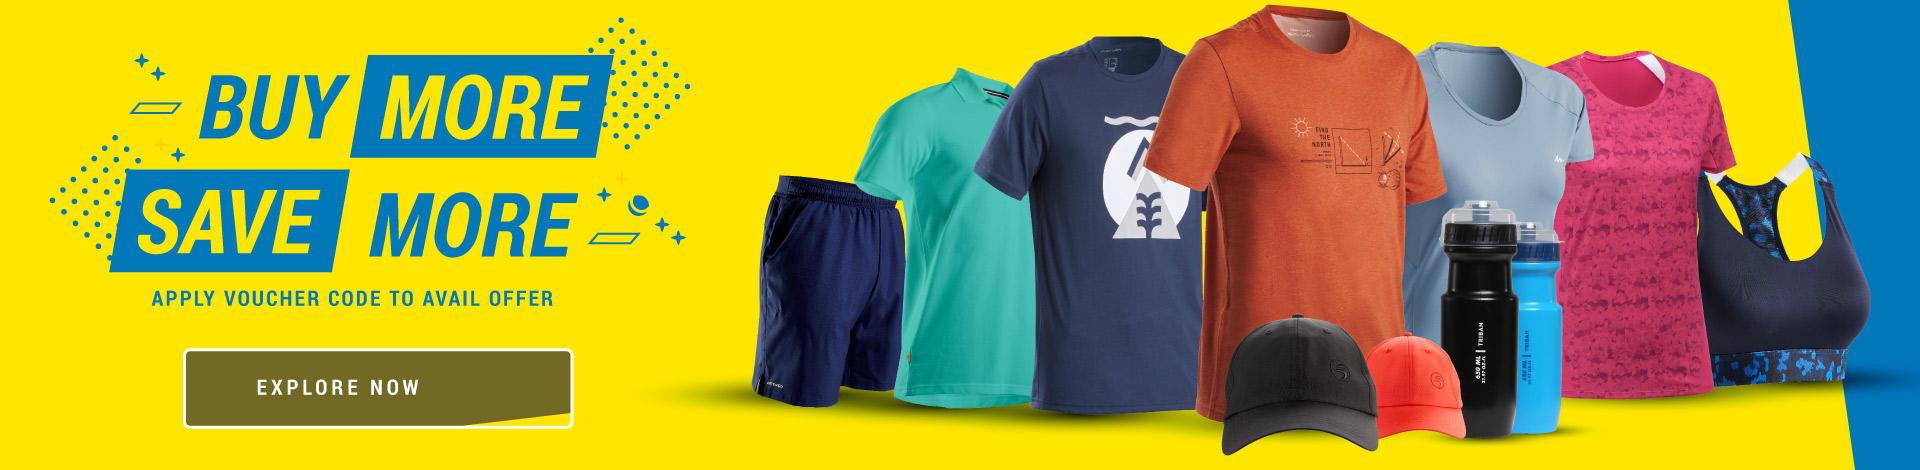 Decathlon multi-buy offers, Decathlon multibuy products